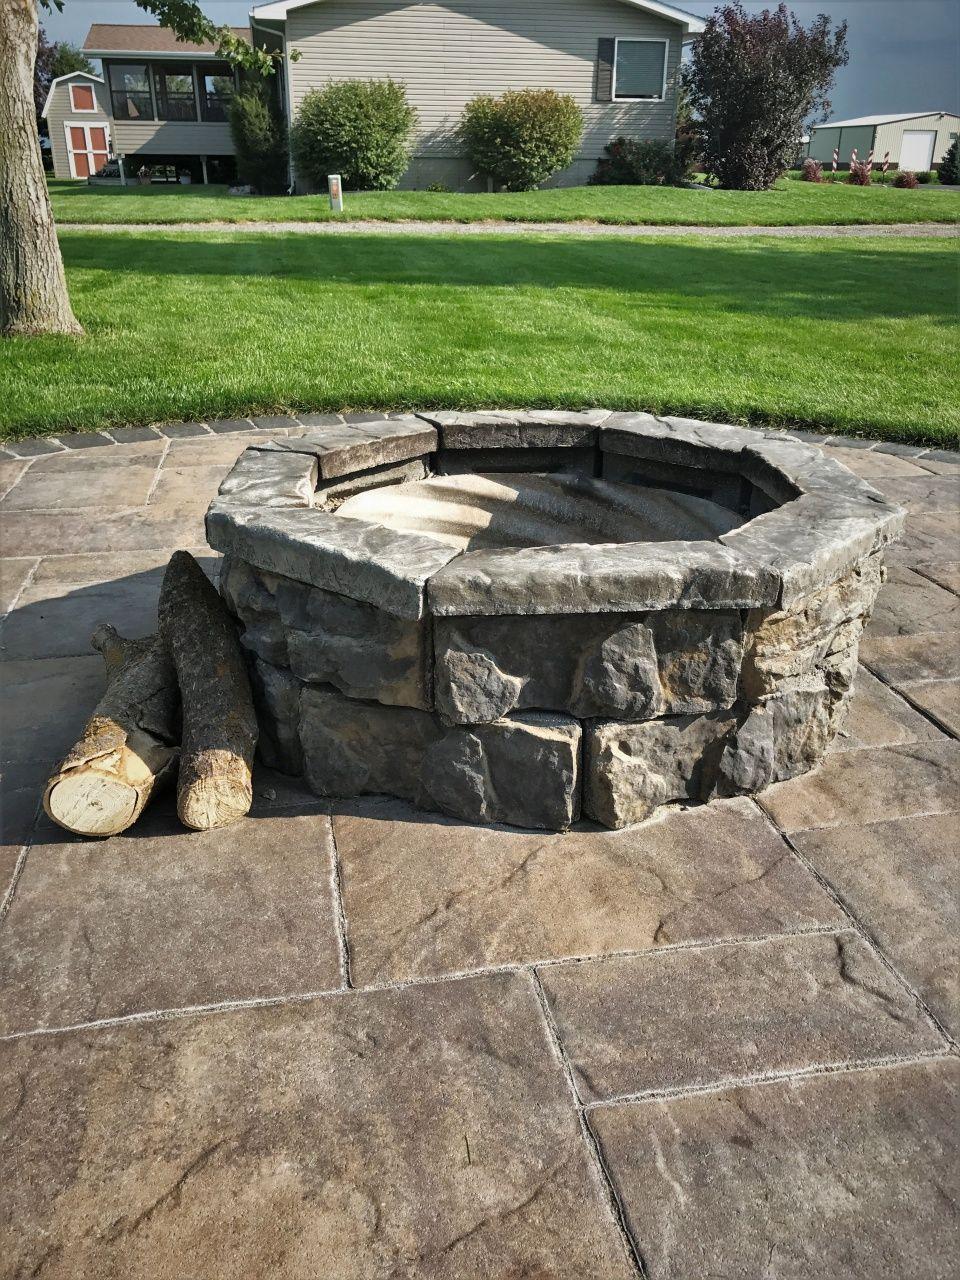 Home Depot Patio Fire Pit In 2020 Backyard Fire Fire Pit Backyard Fire Pit Kit